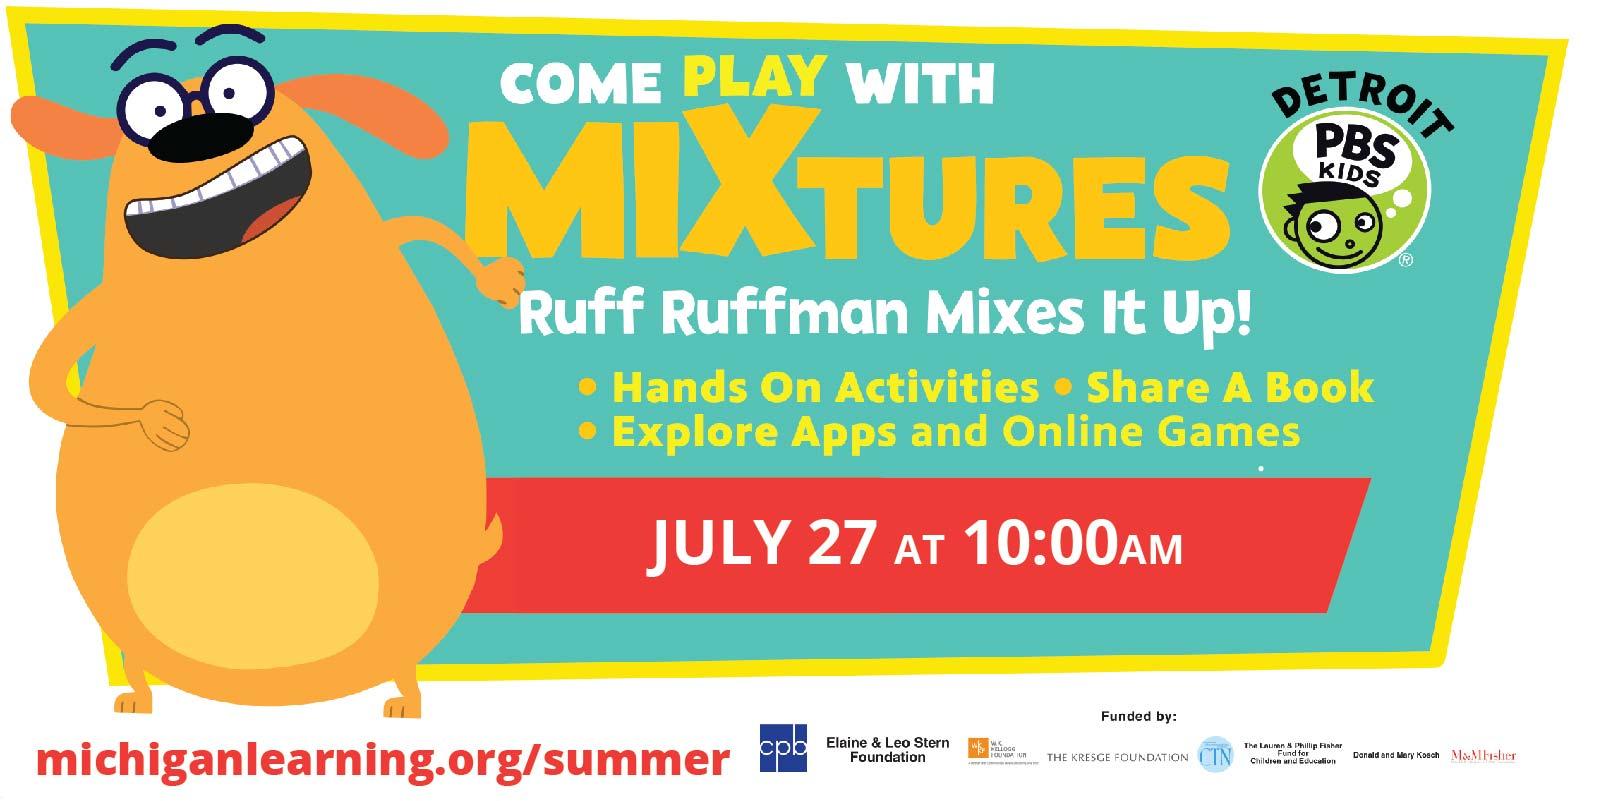 Detroit PBS Kids mixtures with Ruff Ruffman event